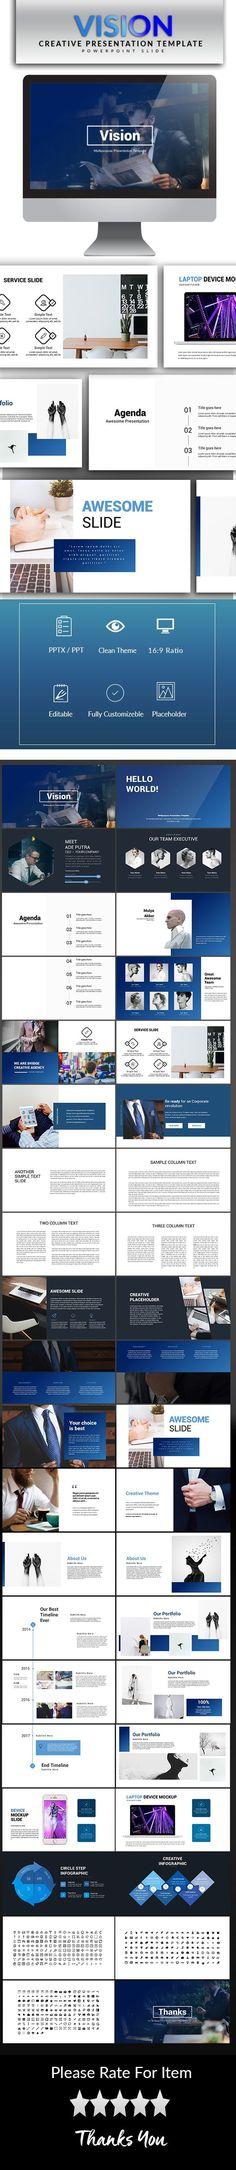 Eco Business Presentation Template  Business Presentation